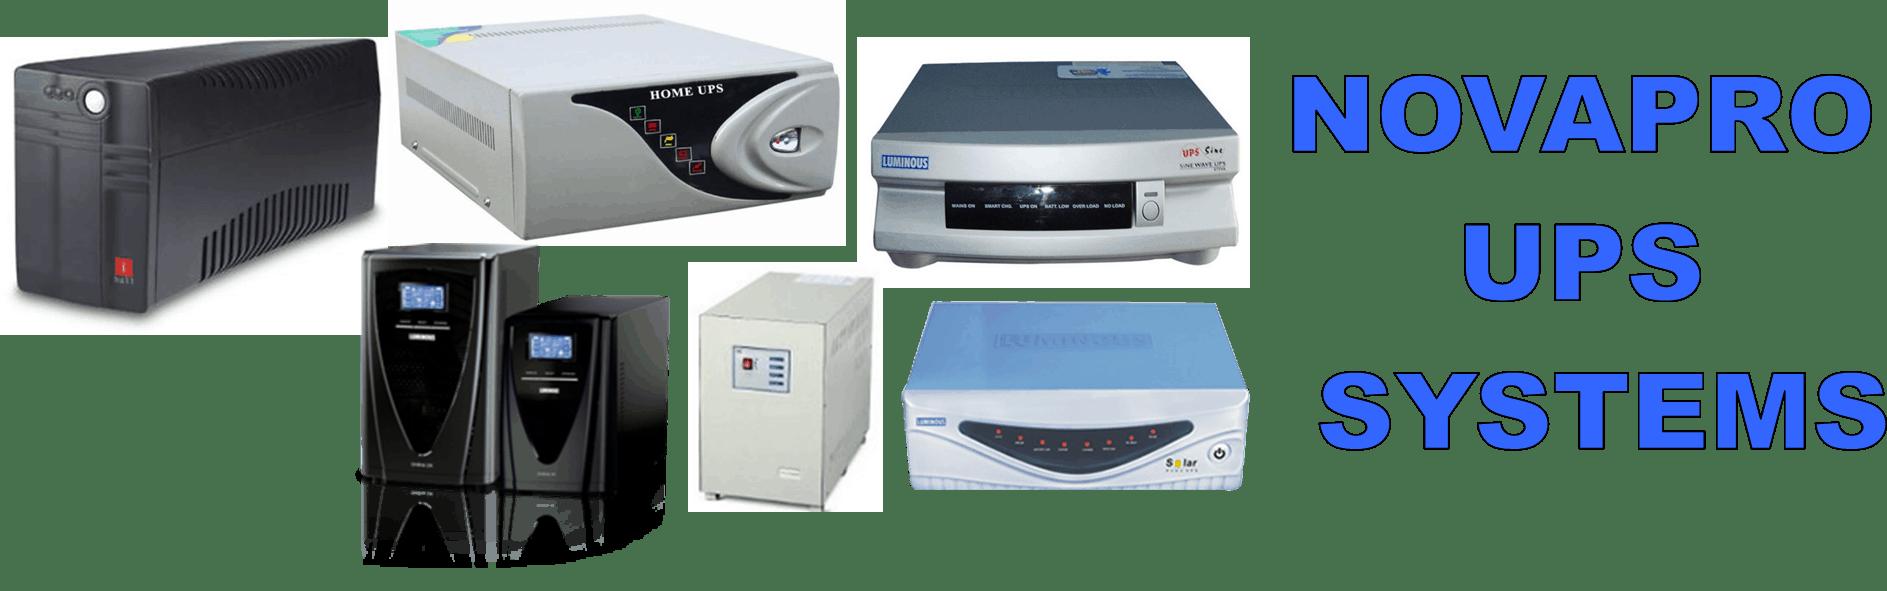 NOVAPRO UPS SYSTEMS